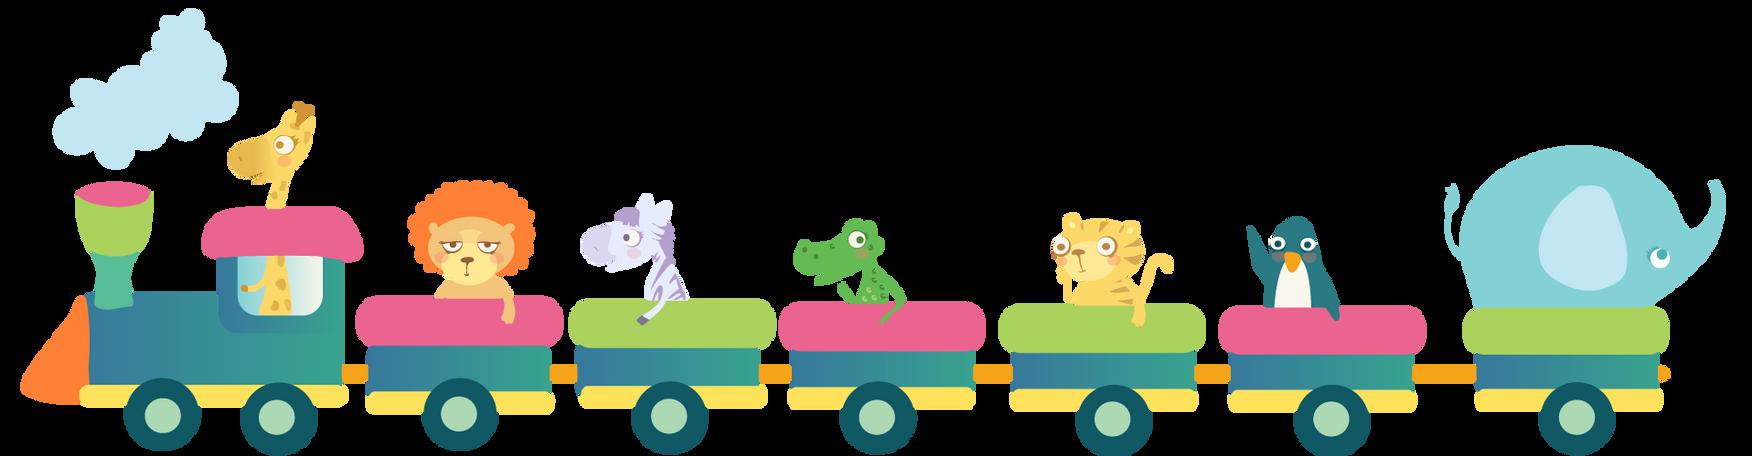 Boy Toys Border : Little cute train by mairimart on deviantart